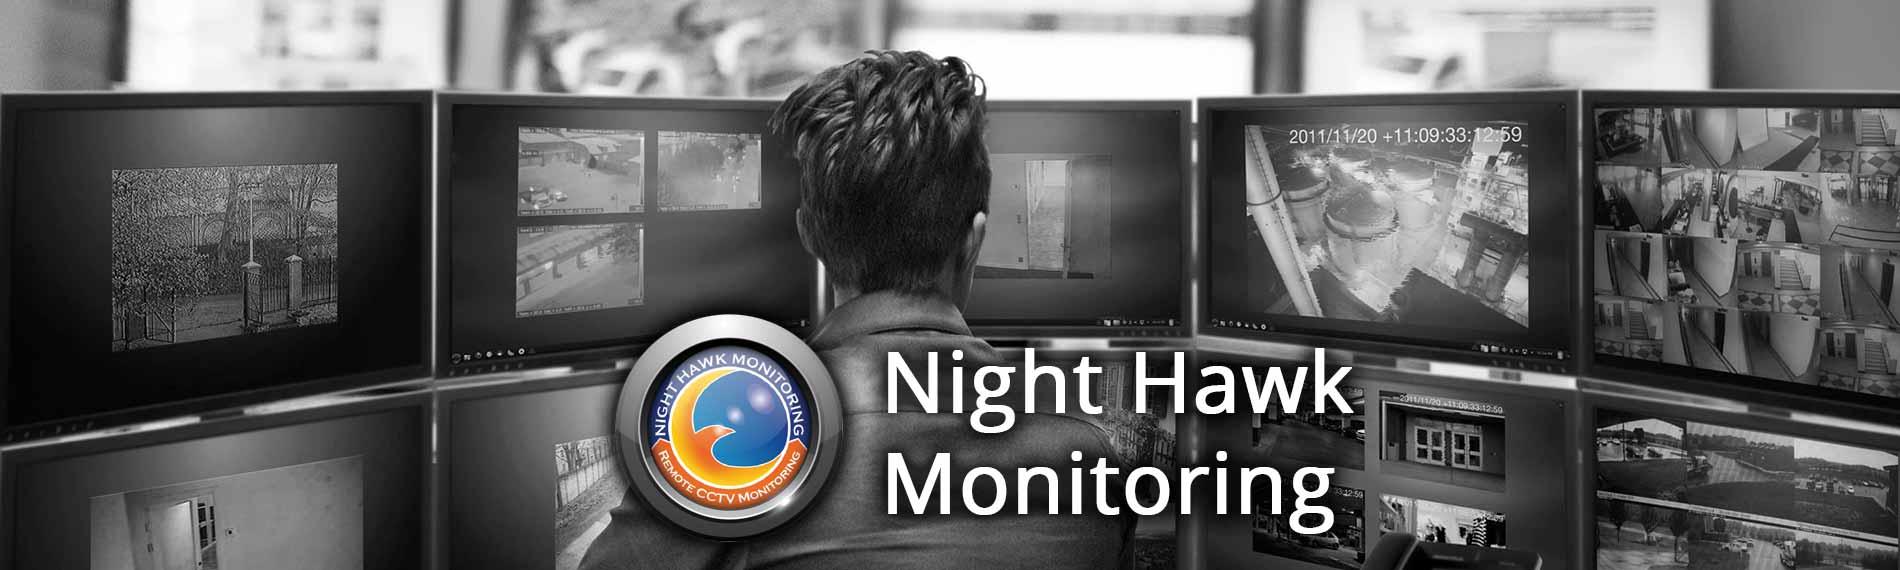 Night Hawk Monitoring - Marijuana Dispensary Remote Security Surveillance / Cannabis Security Remote Surveillance